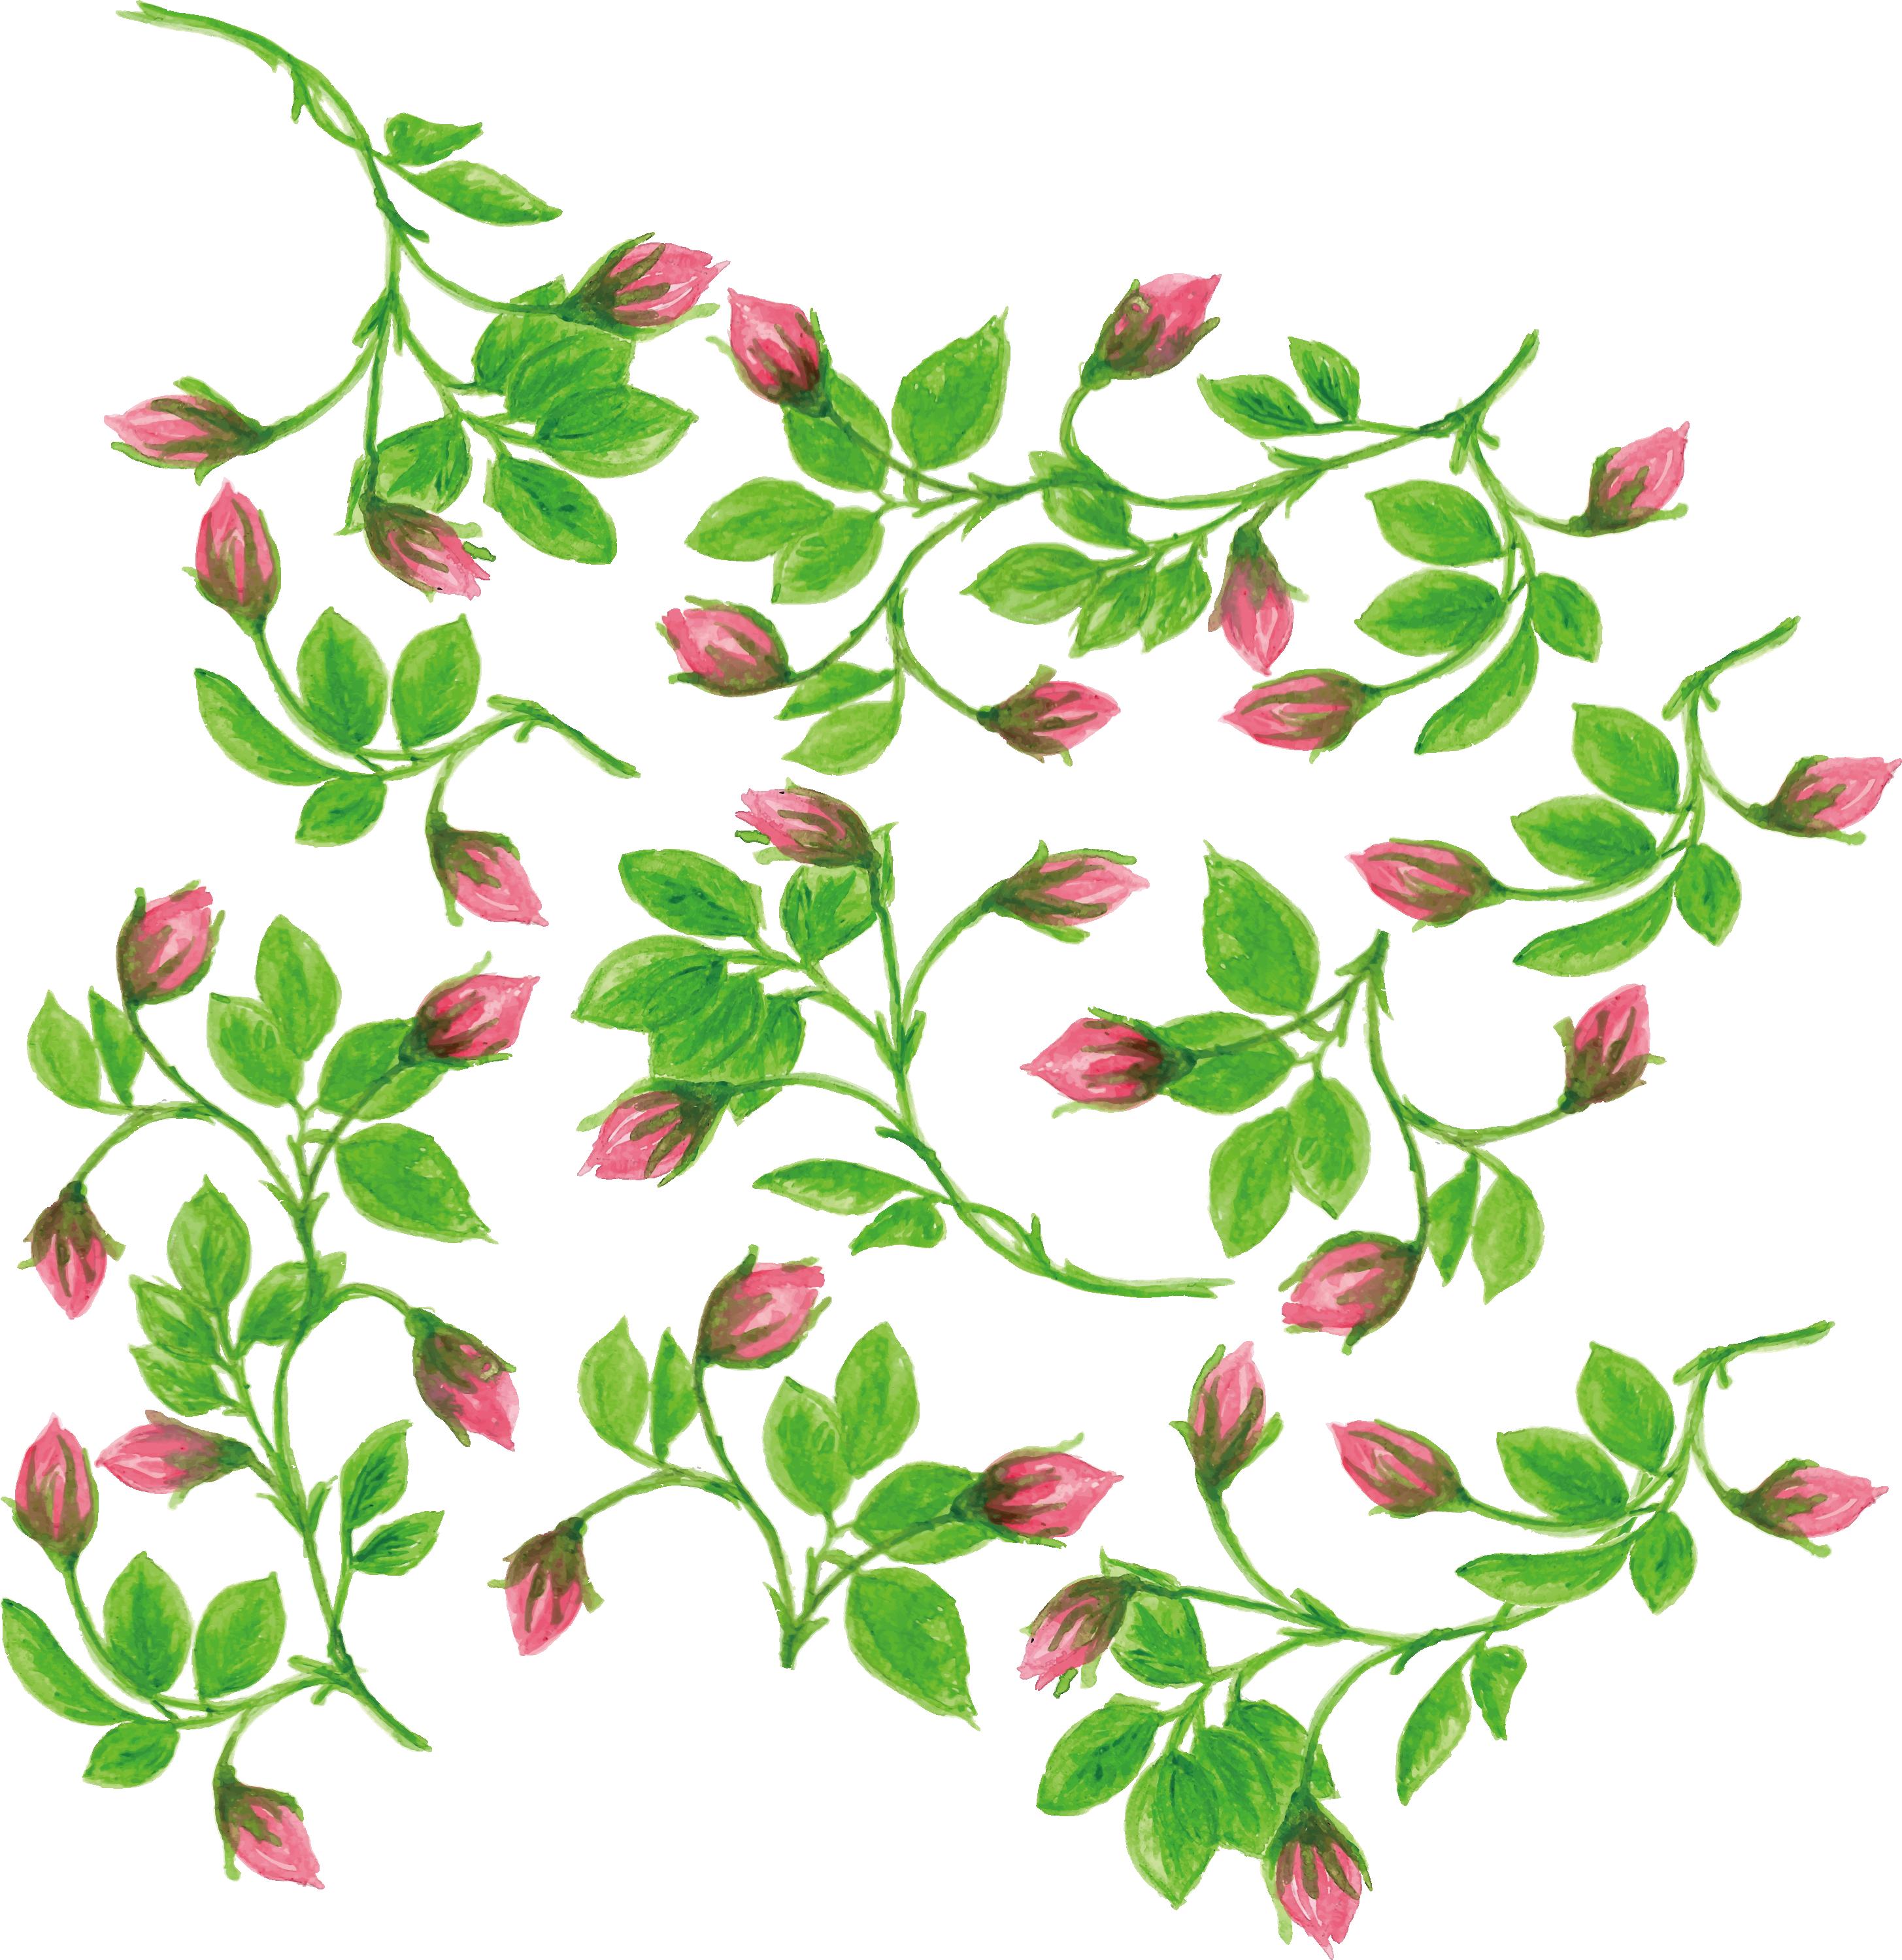 Flower vine png. Watercolor painting water color